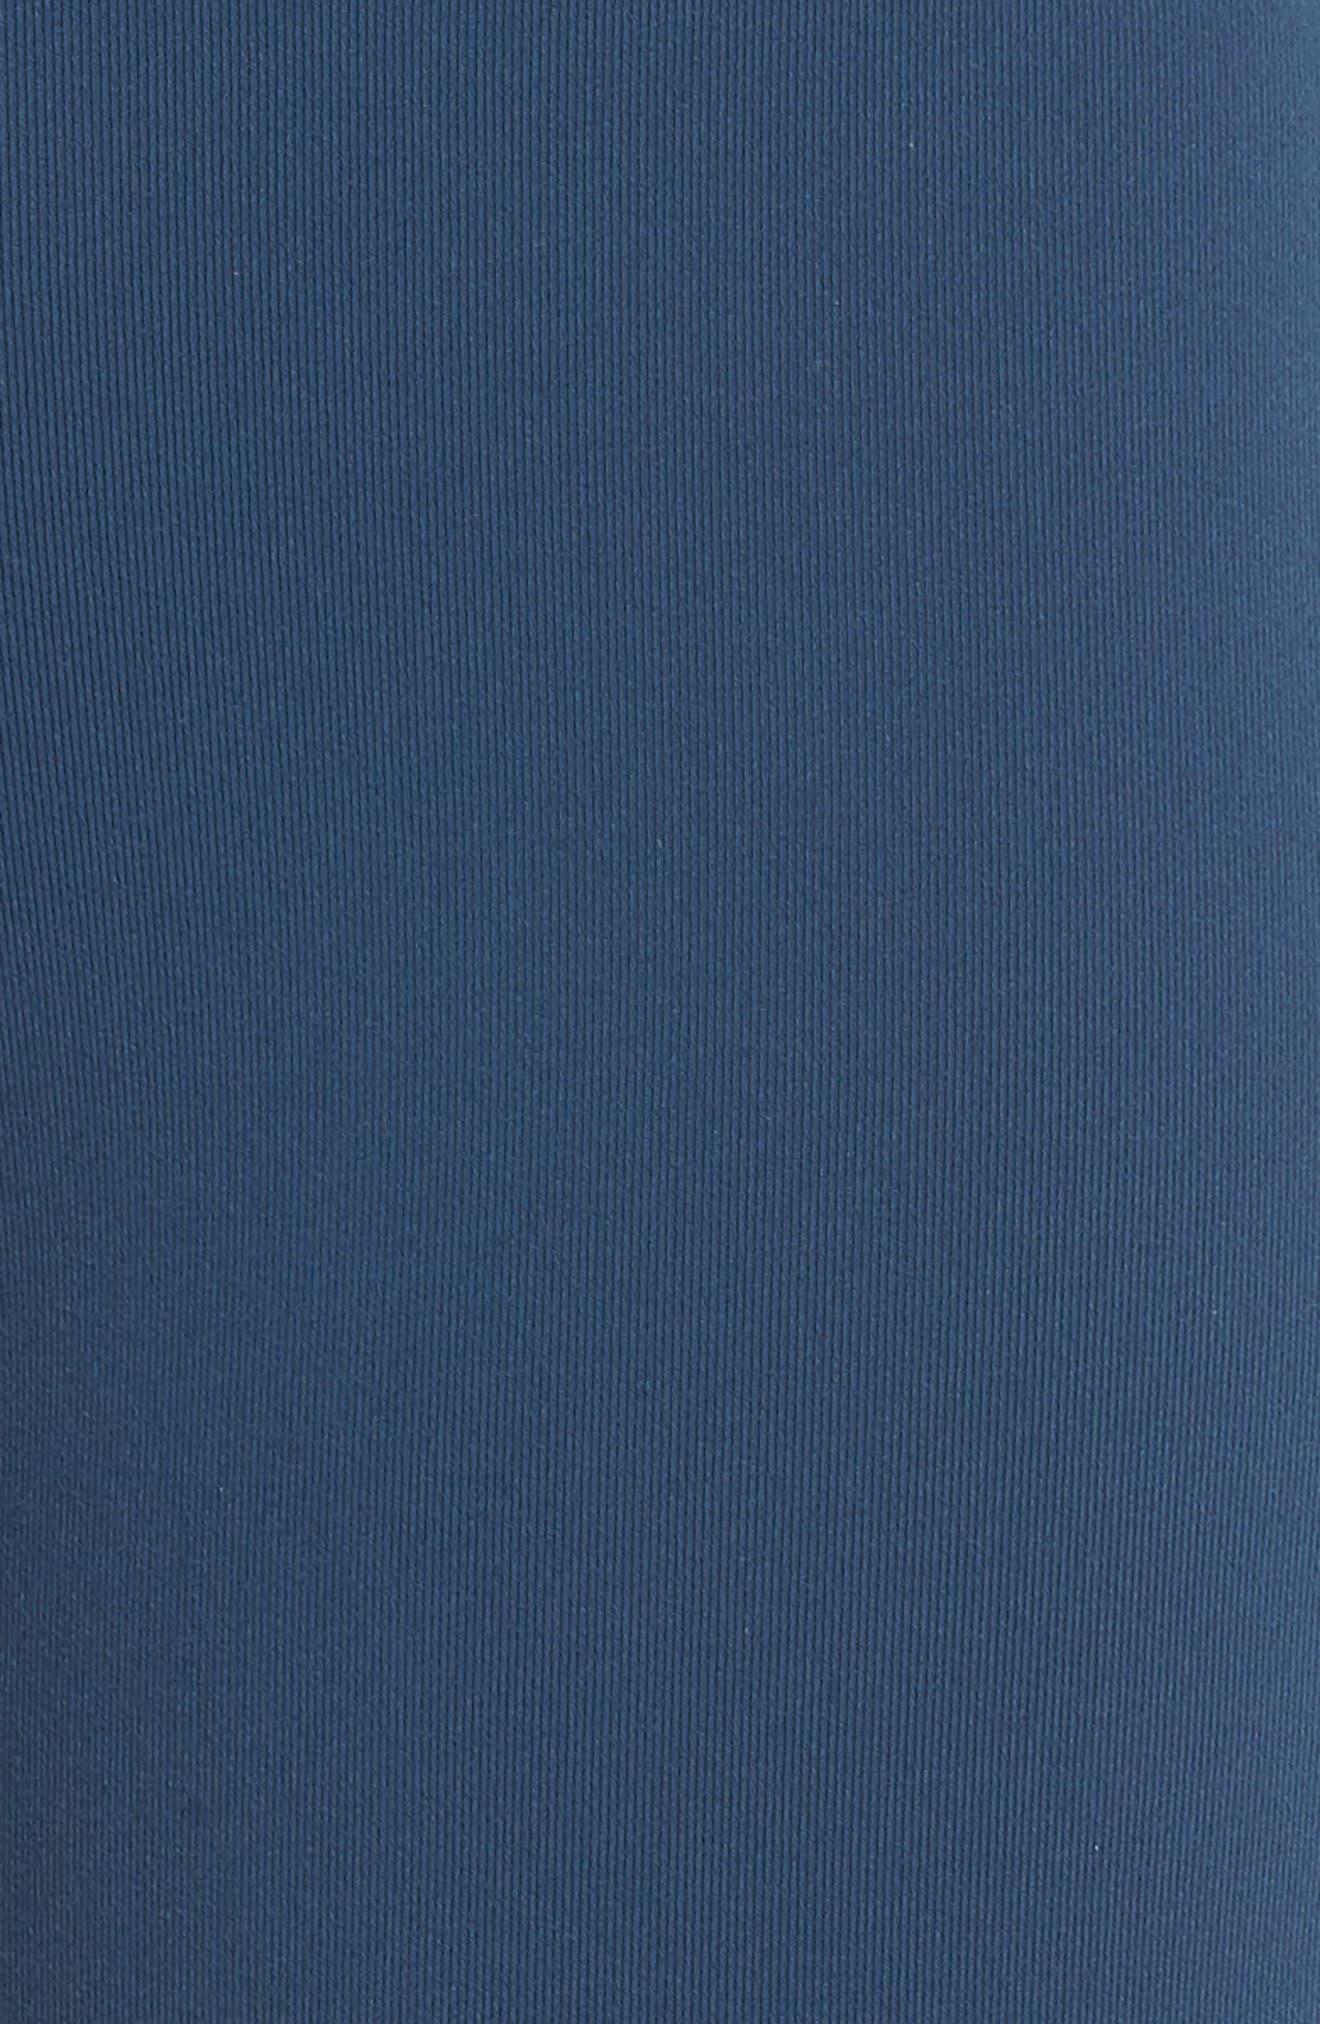 High Waist Moto Leggings,                             Alternate thumbnail 6, color,                             ECLIPSE/ ECLIPSE GLOSSY